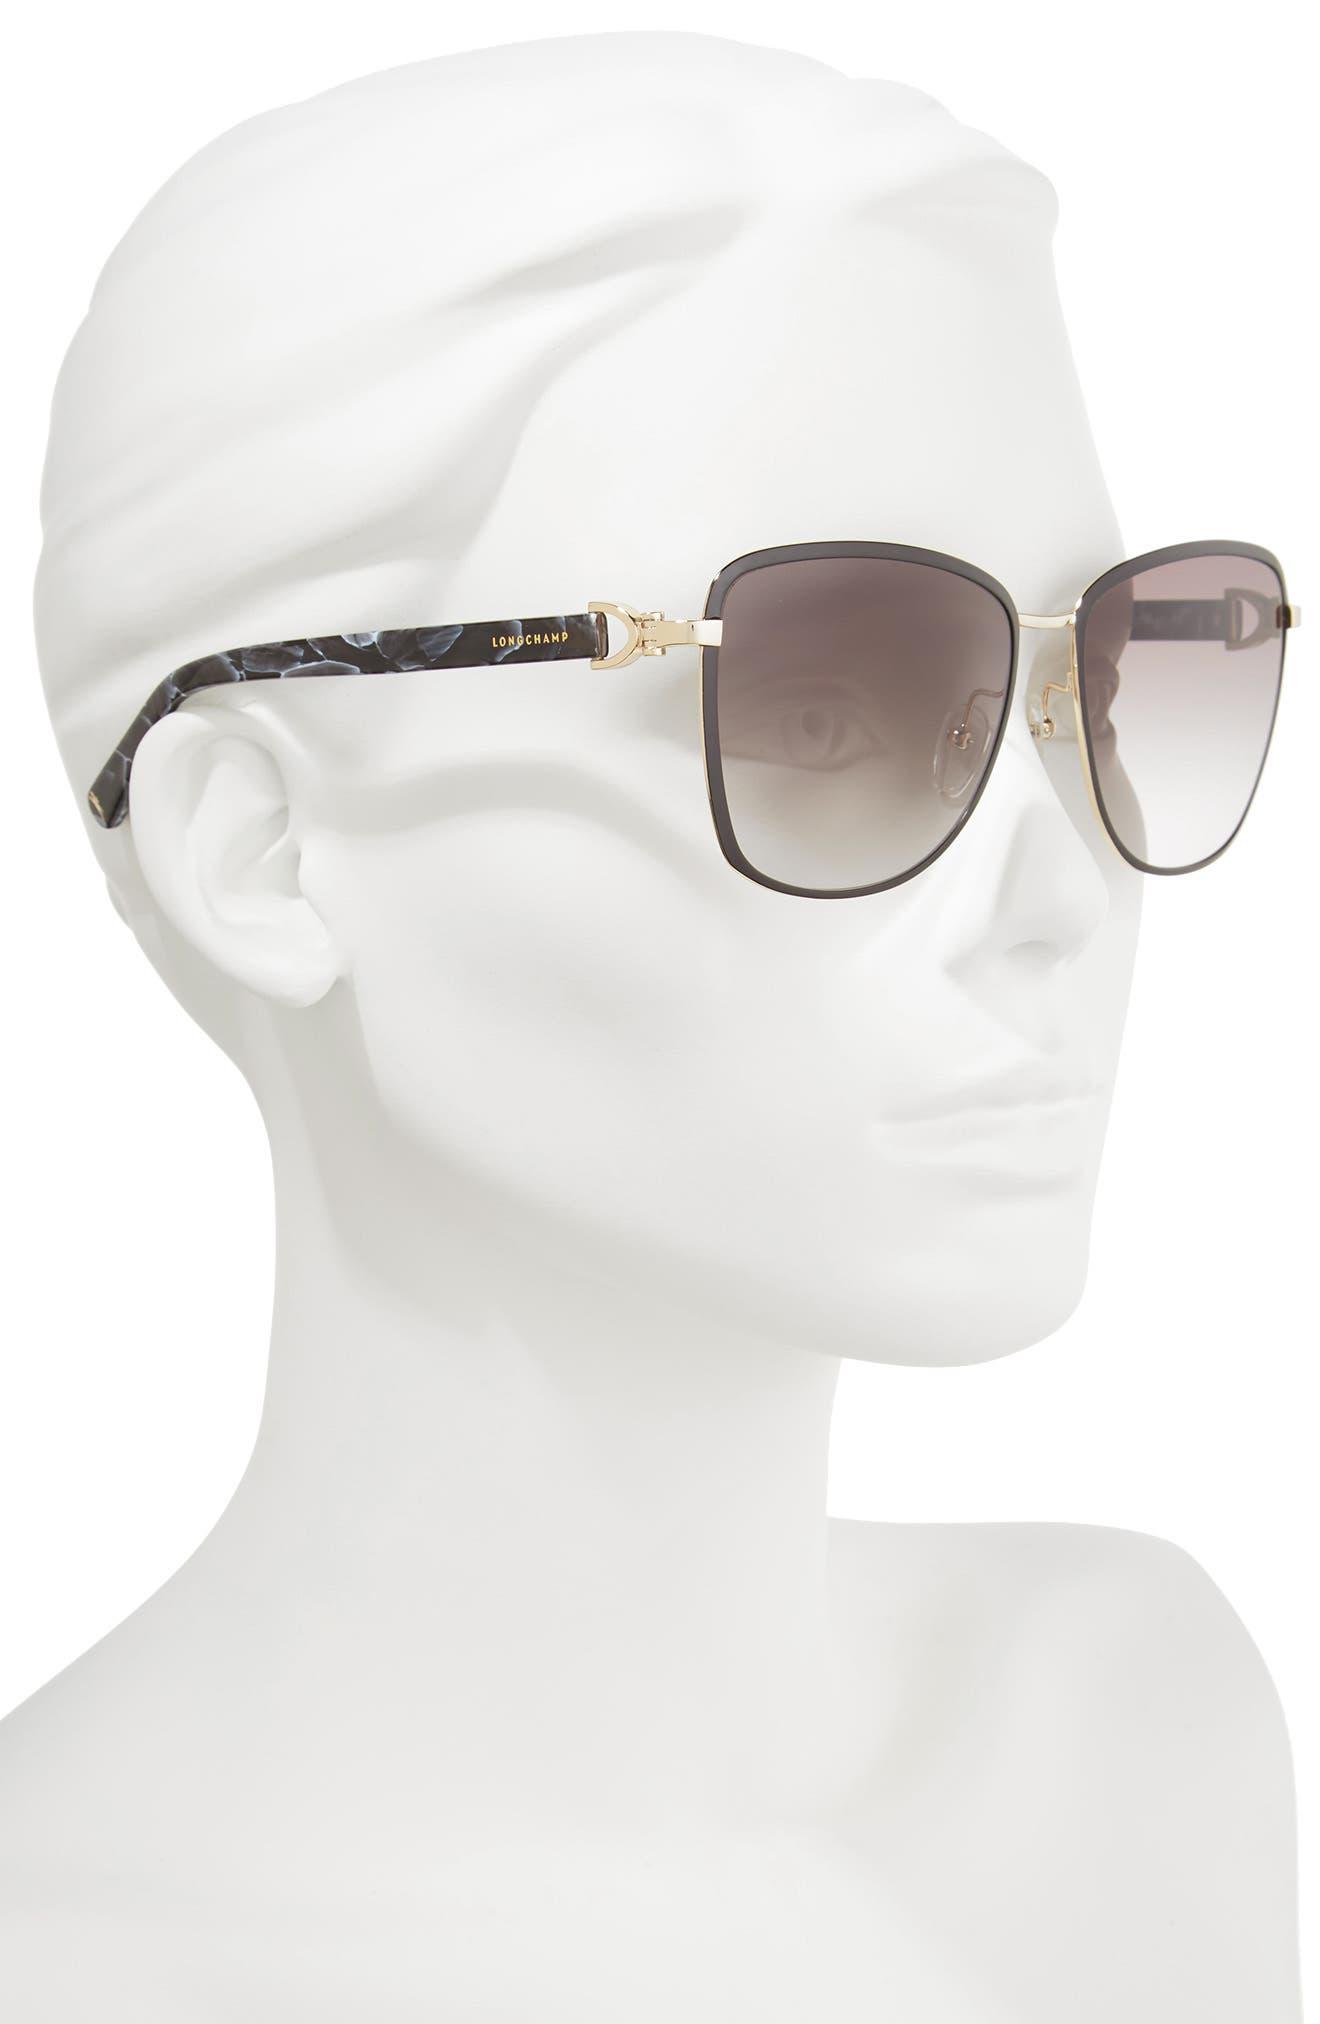 58mm Metal Sunglasses,                             Alternate thumbnail 2, color,                             GOLD/ BLACK